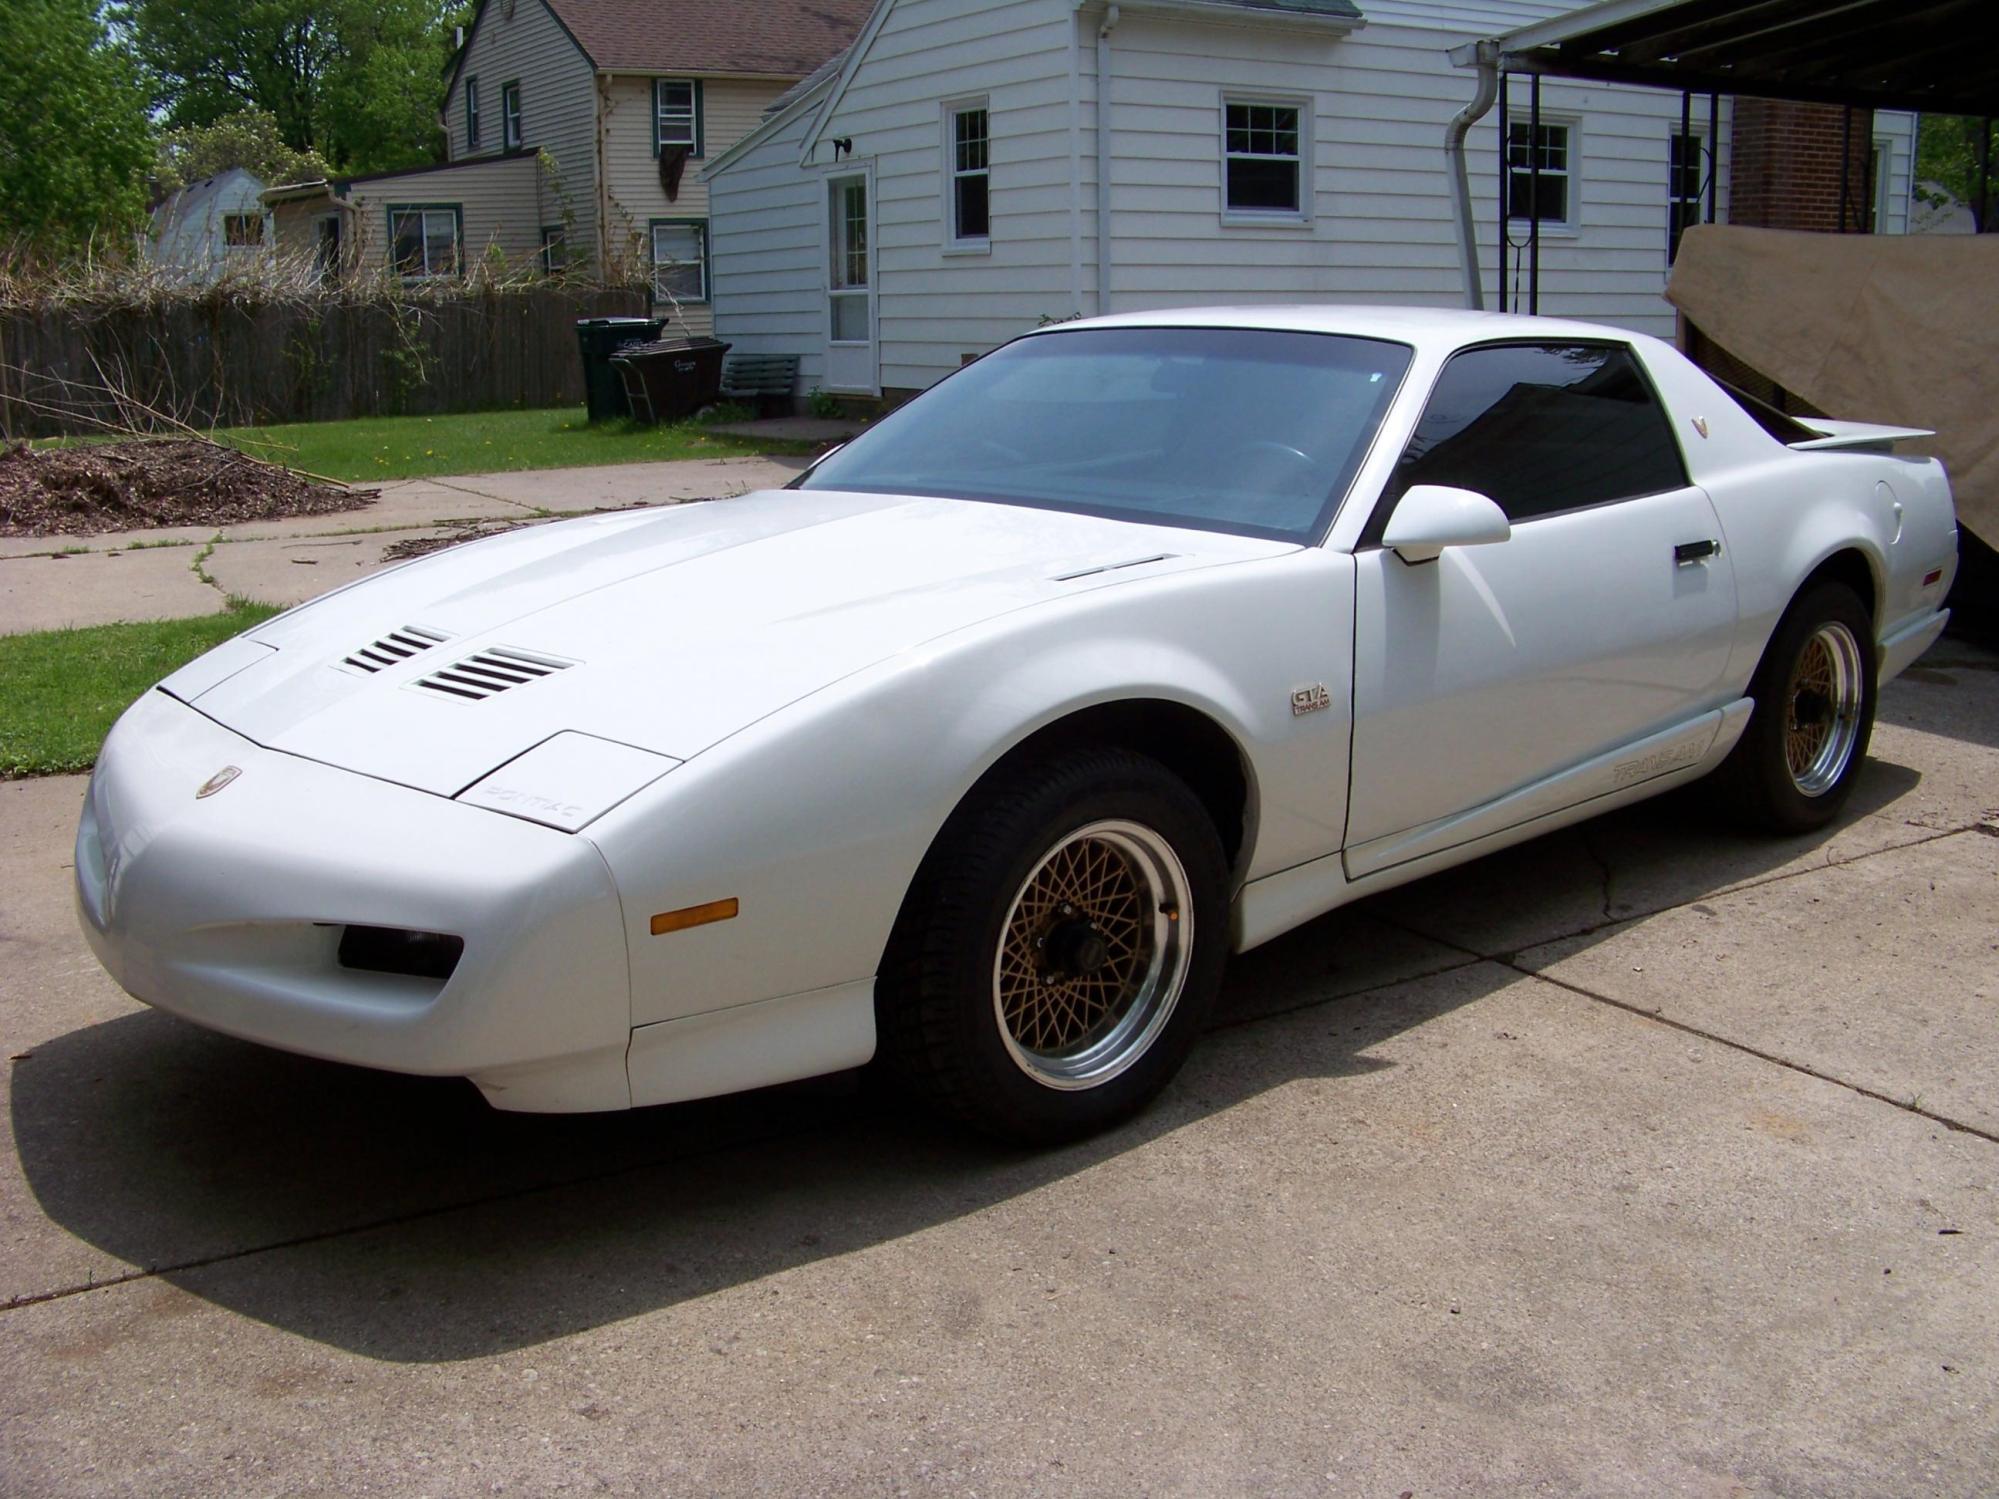 hight resolution of 1989 pontiac trans am turbo for sale michigan 1991 pontiac trans am gta ws6